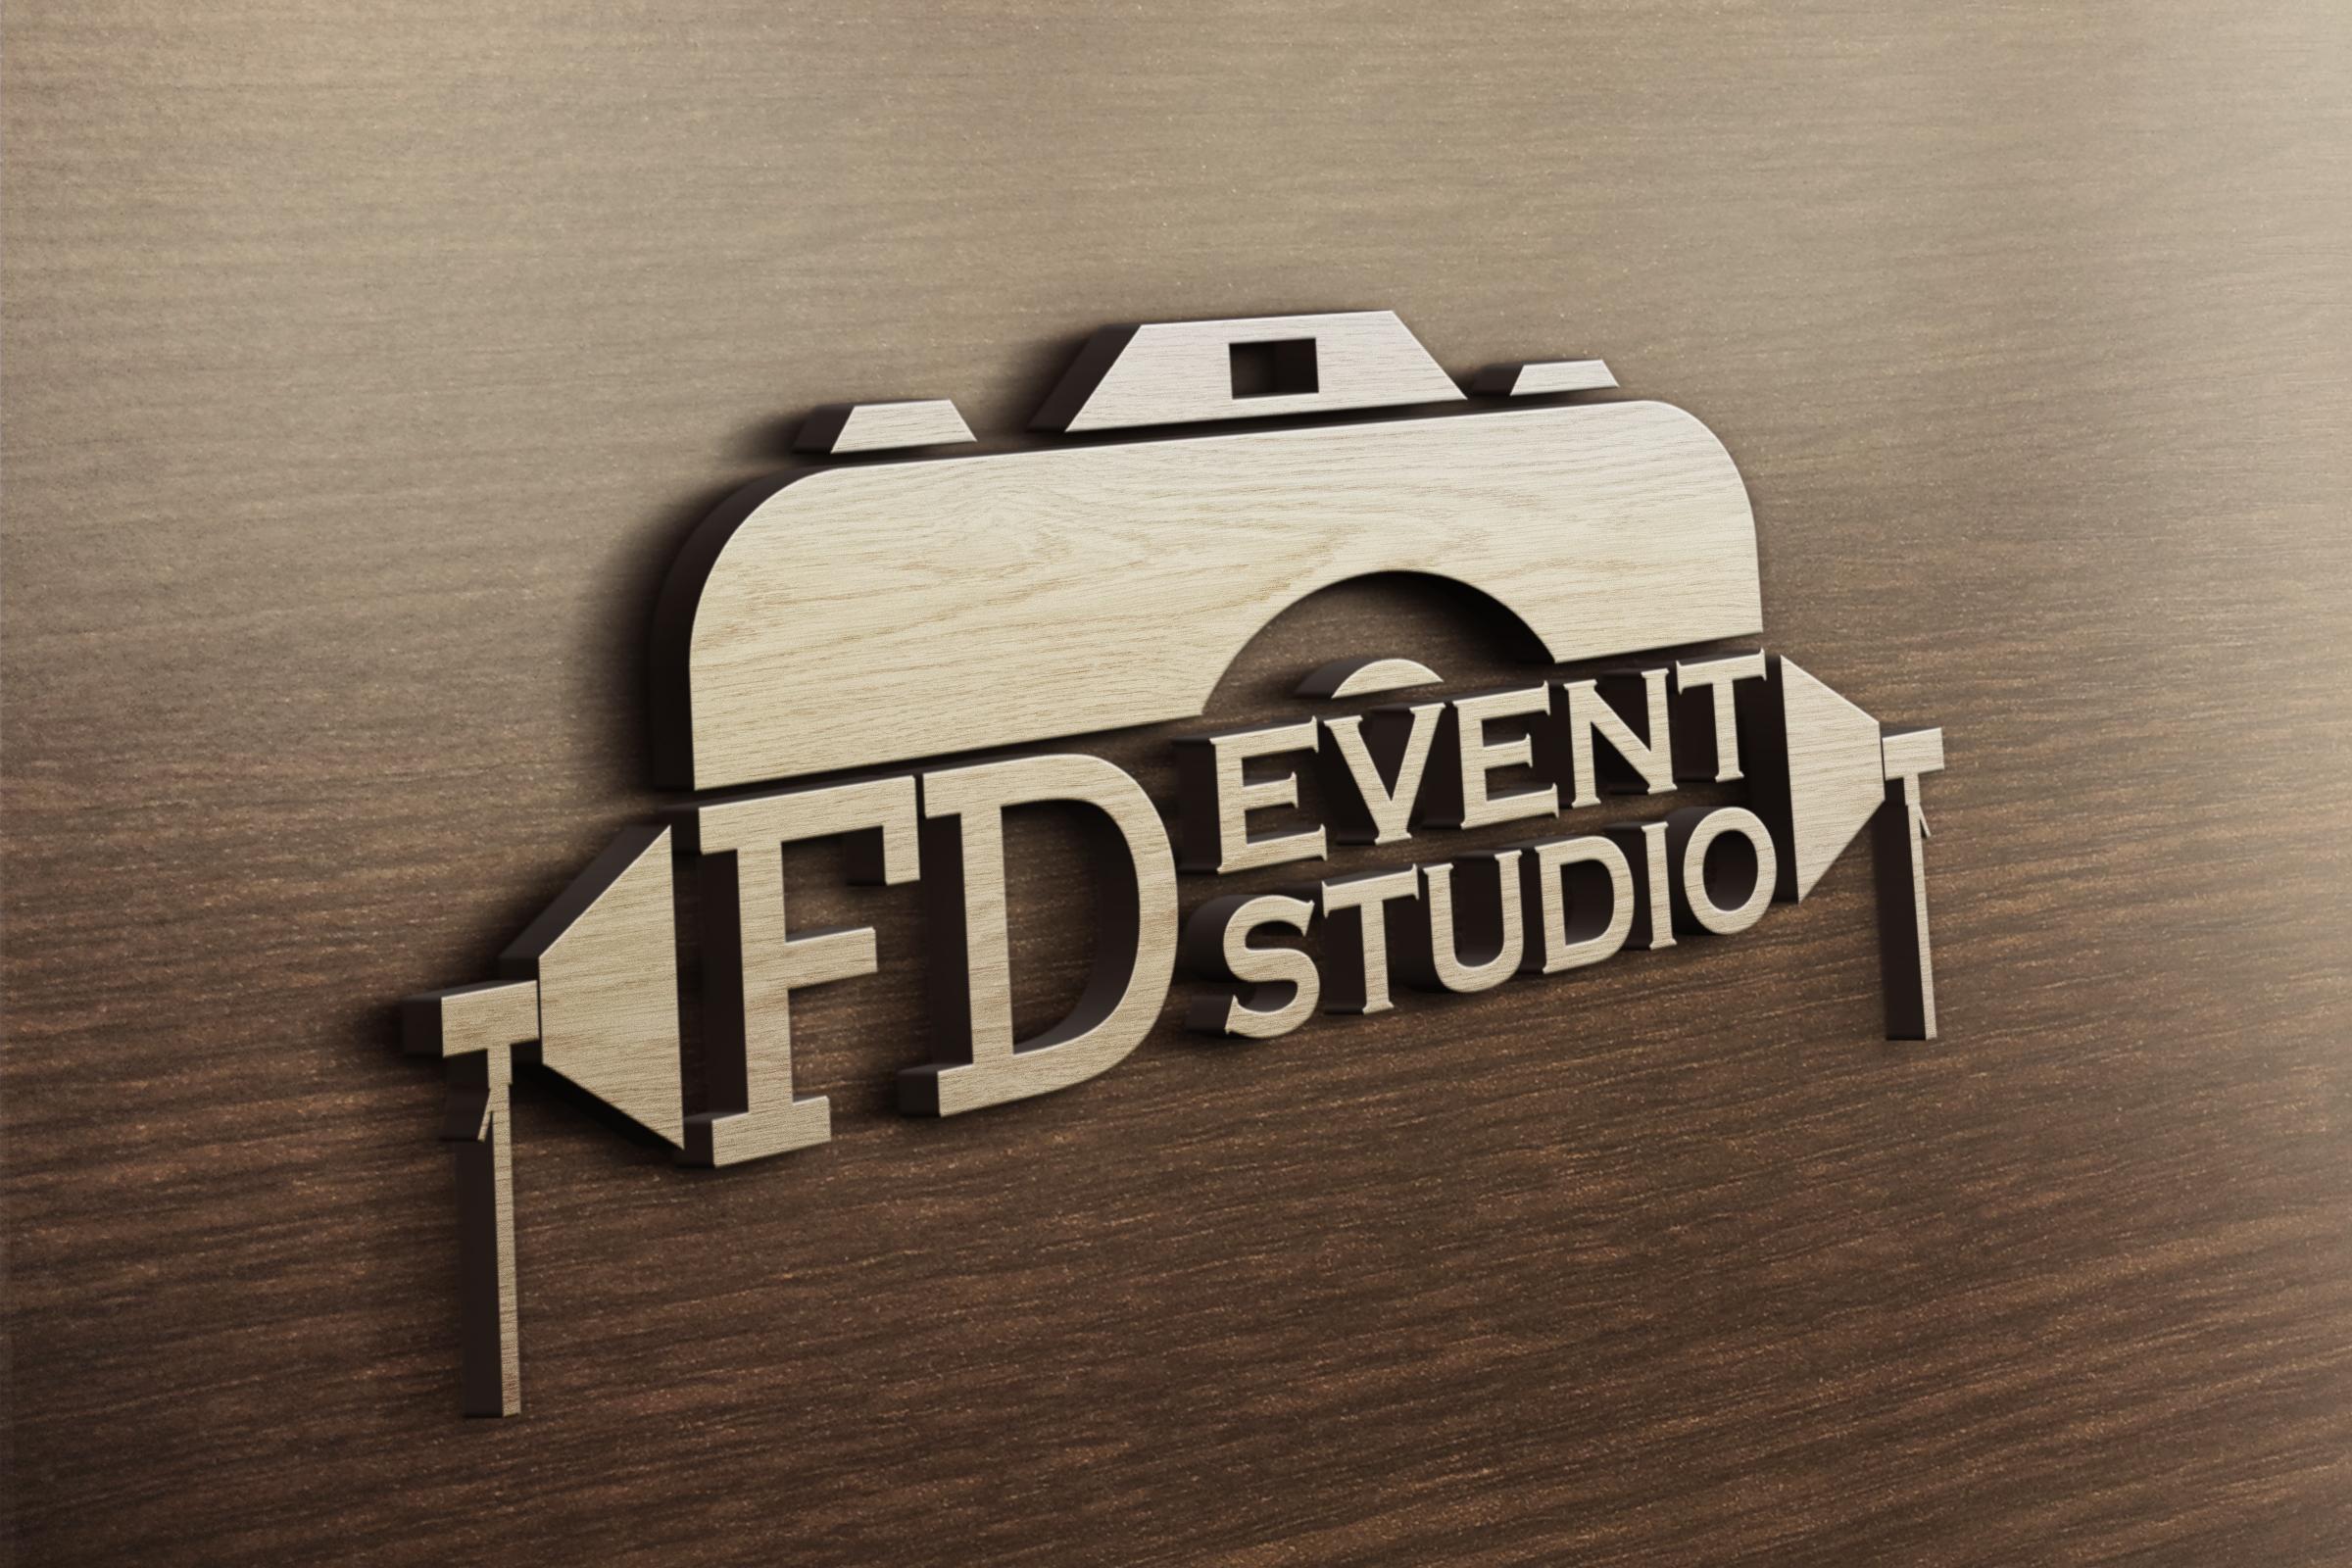 FD EVENT STUDIO